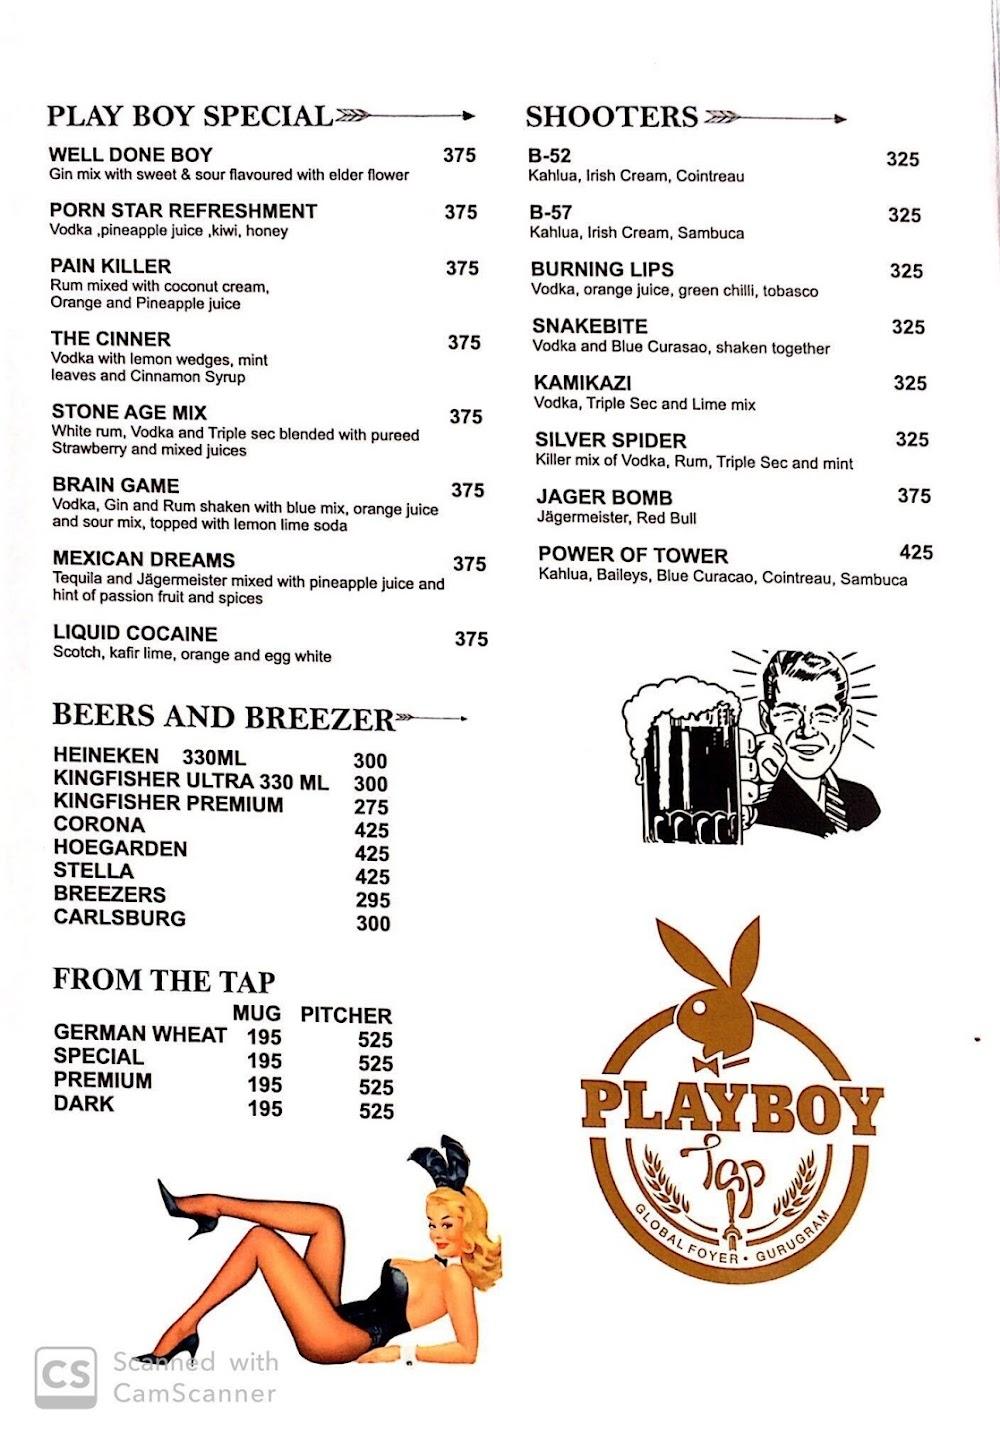 Playboy Tap menu 1